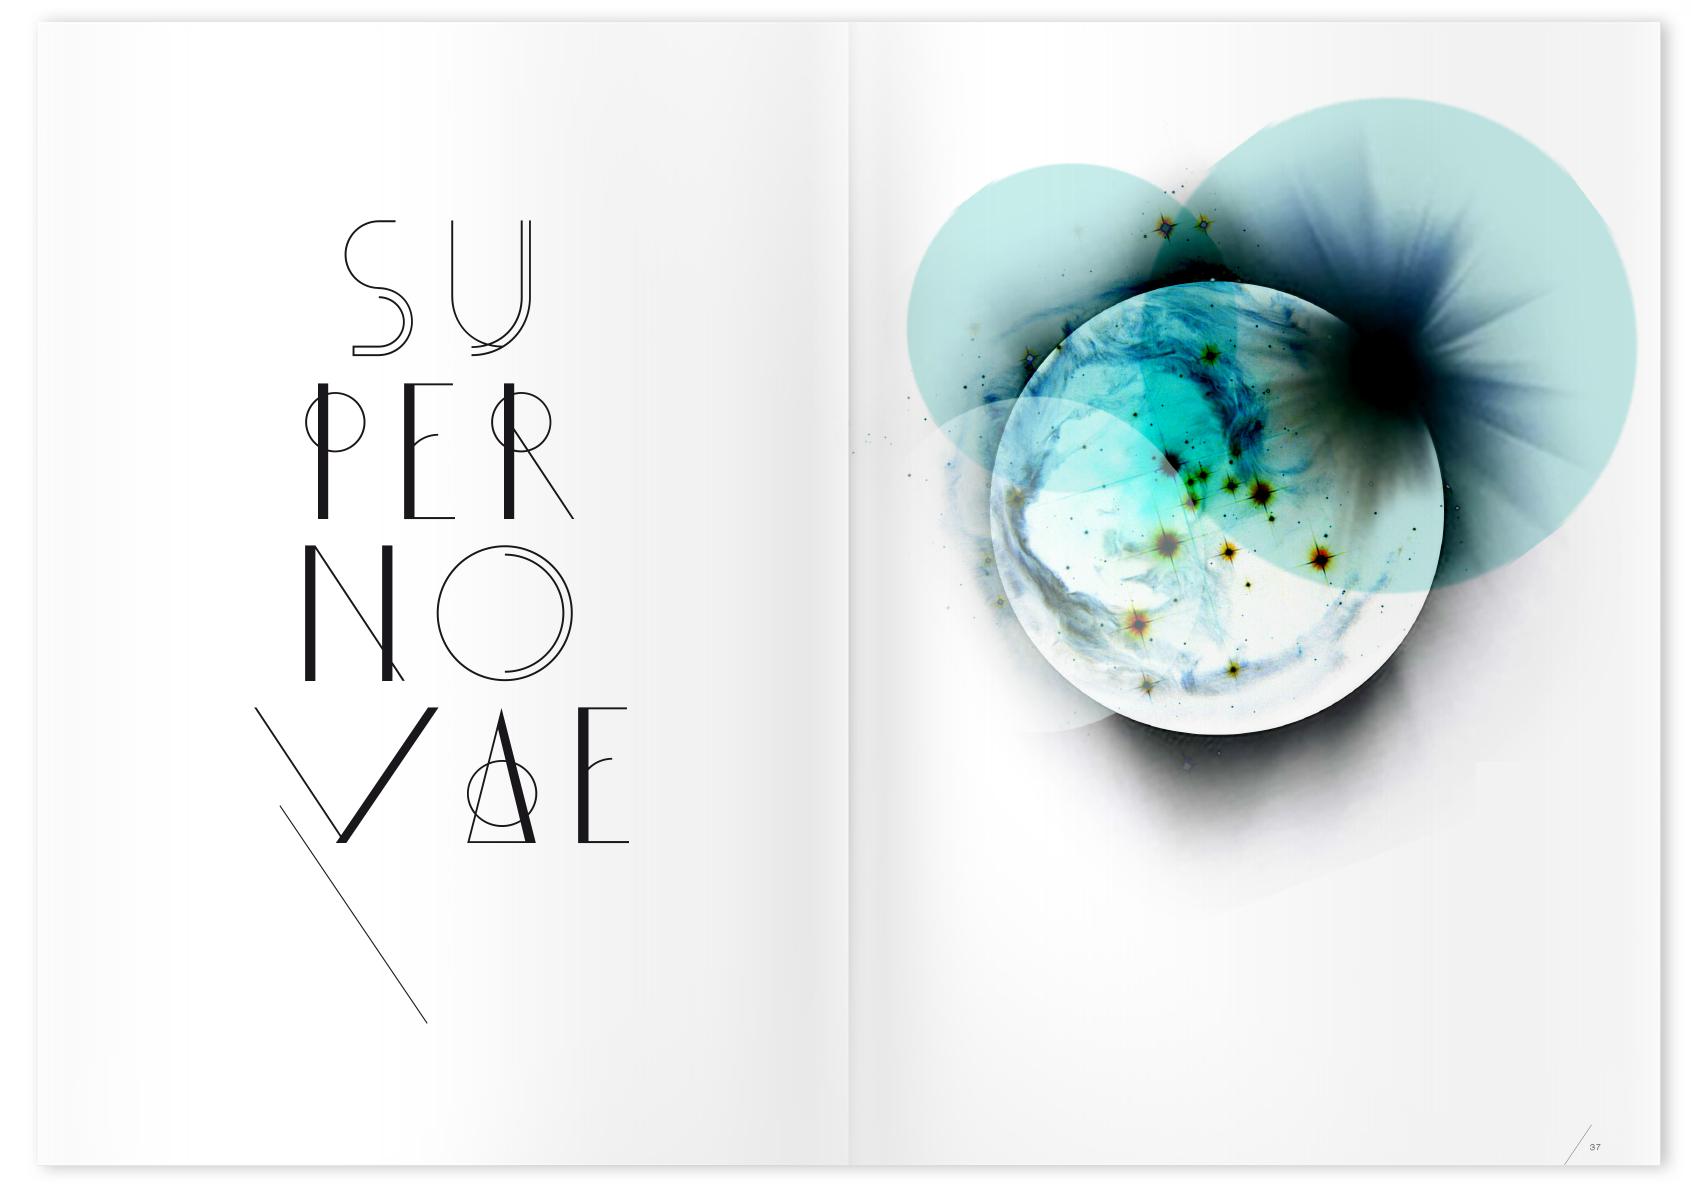 08_Cosmos-Magazin_hsrm-Hochschule-RheinMain_Editorial-Design_Grafikdesign_Gloria-Kison.jpg